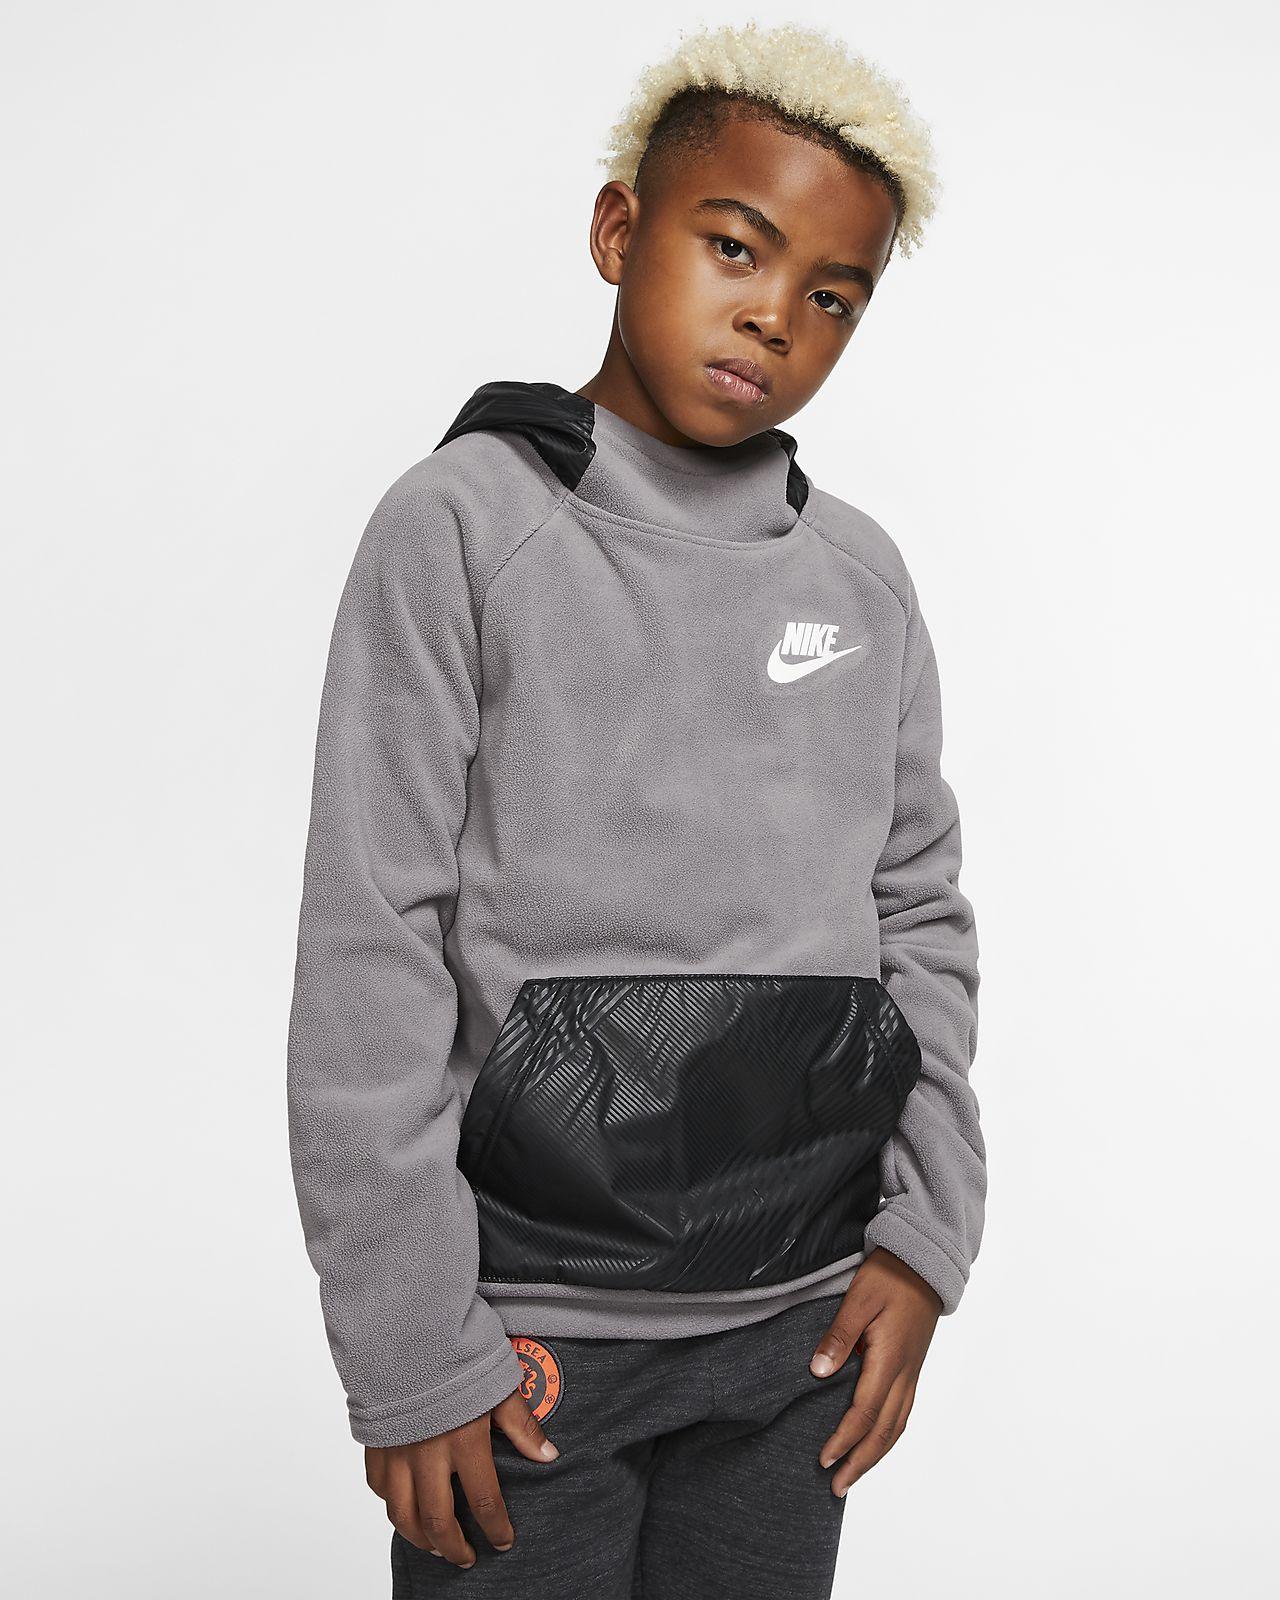 Nike Sportswear kapucnis pulóver nagyobb gyerekeknek (fiúk)